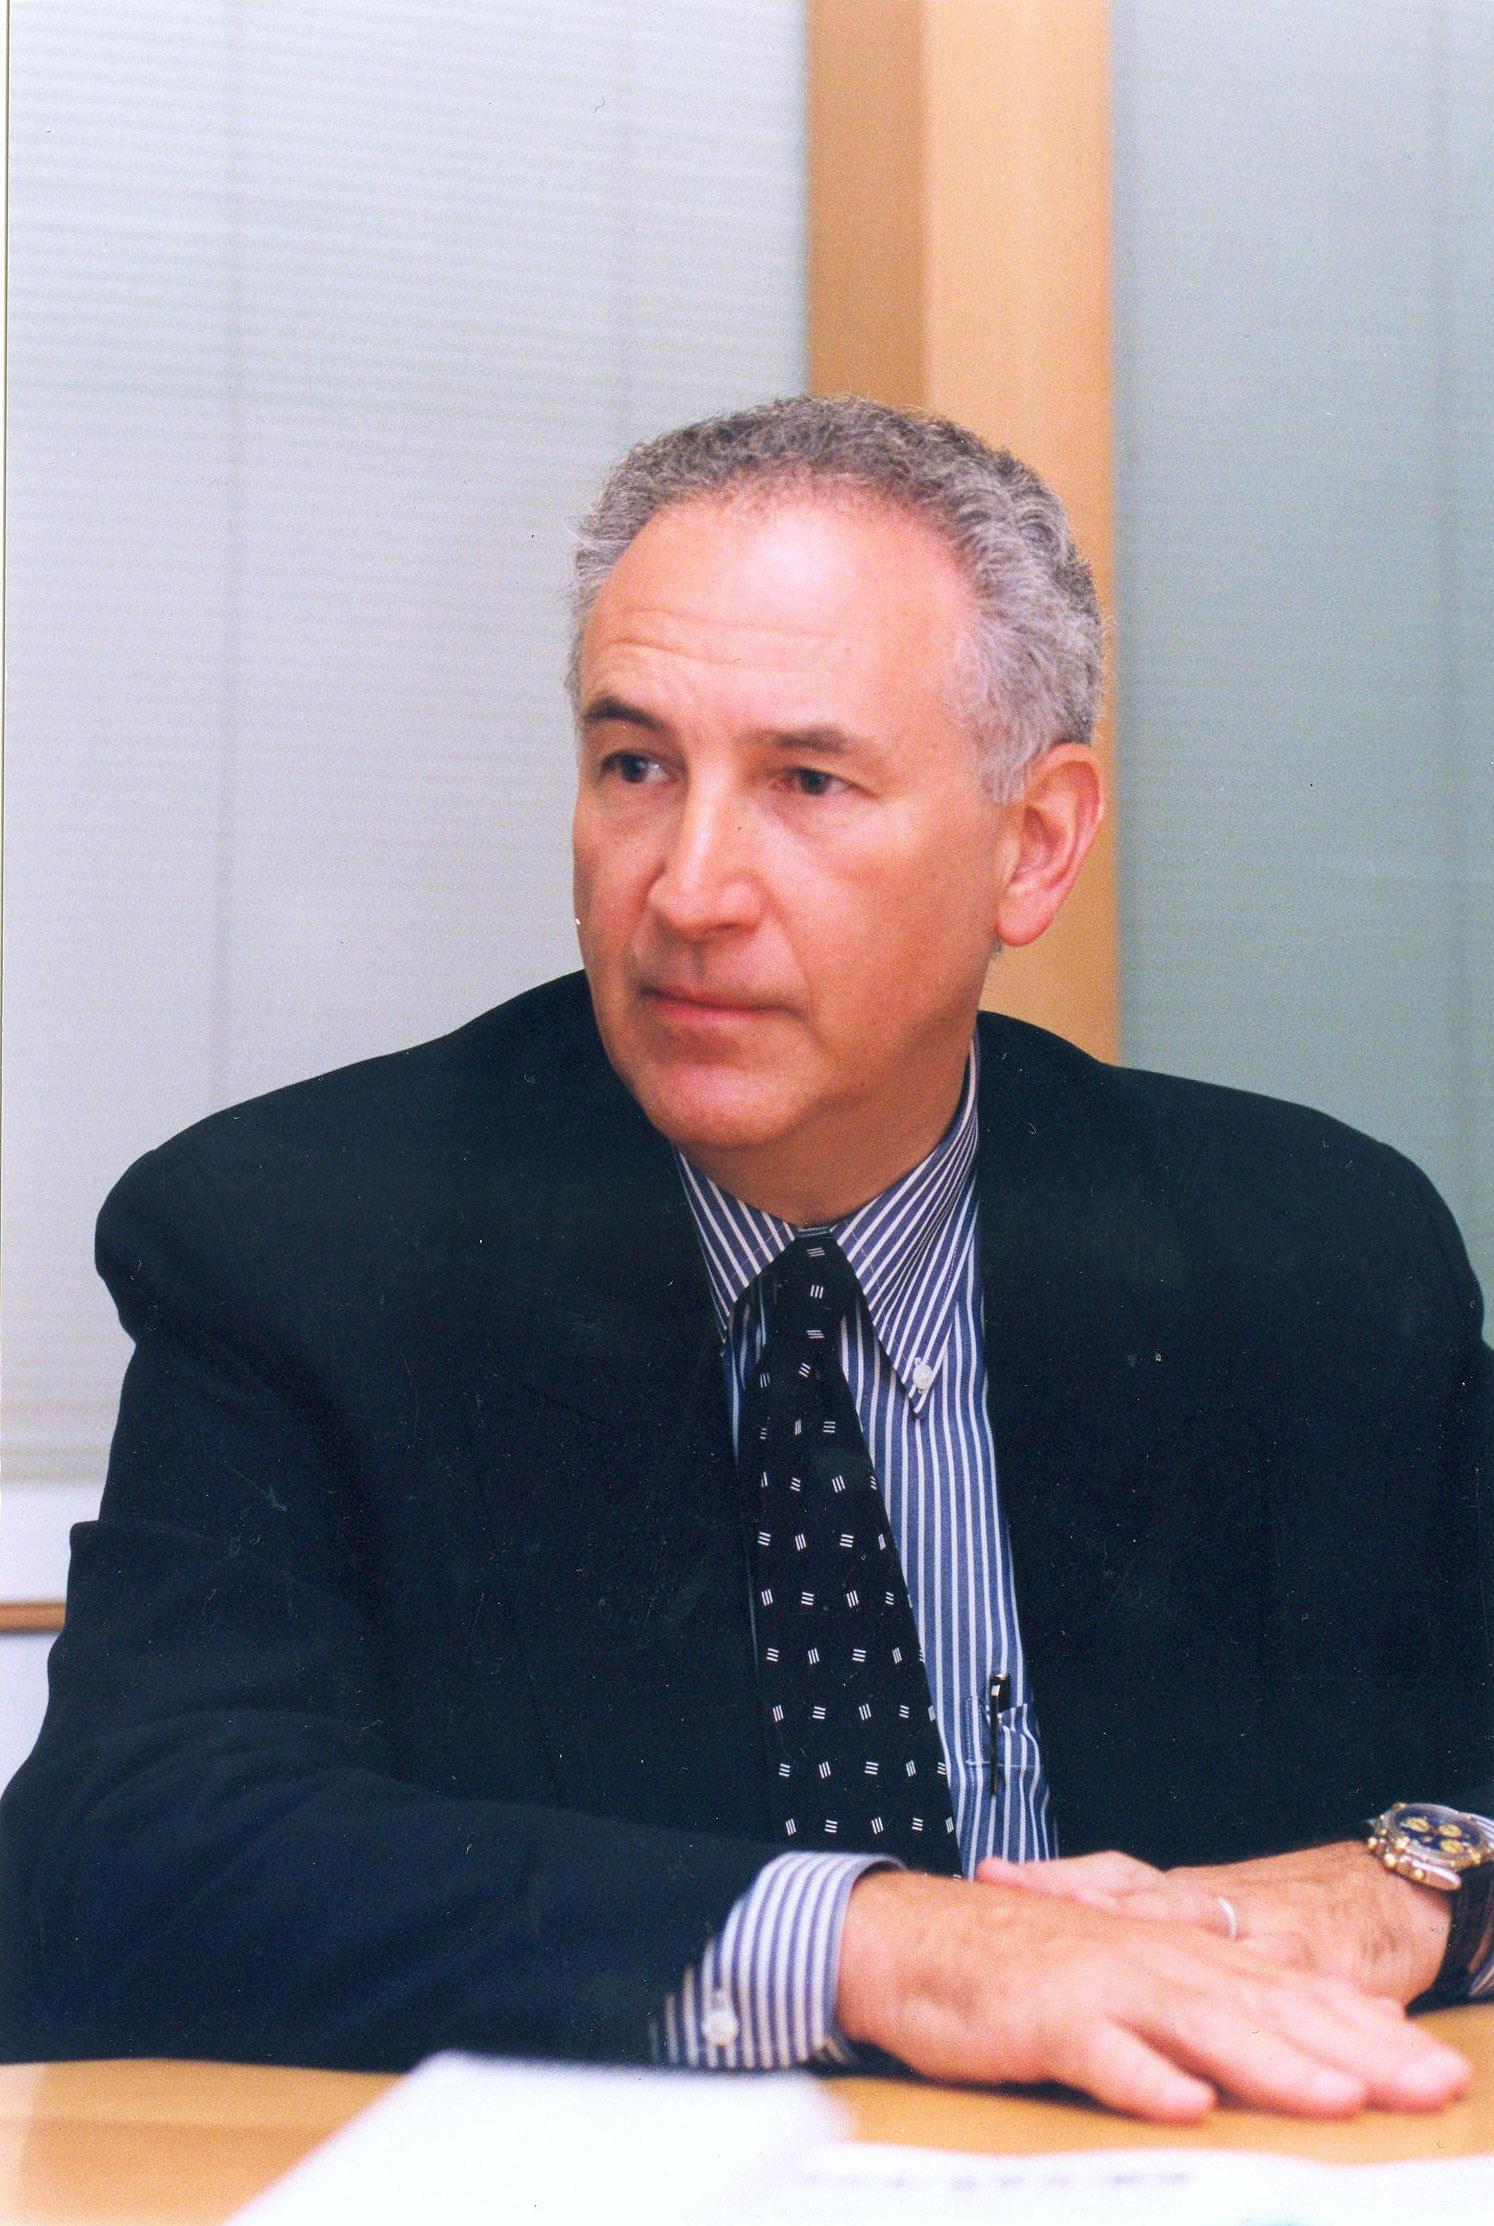 Eagle  co-publisher Michael Nussbaum. Photo courtesy of Michael Nussbaum.